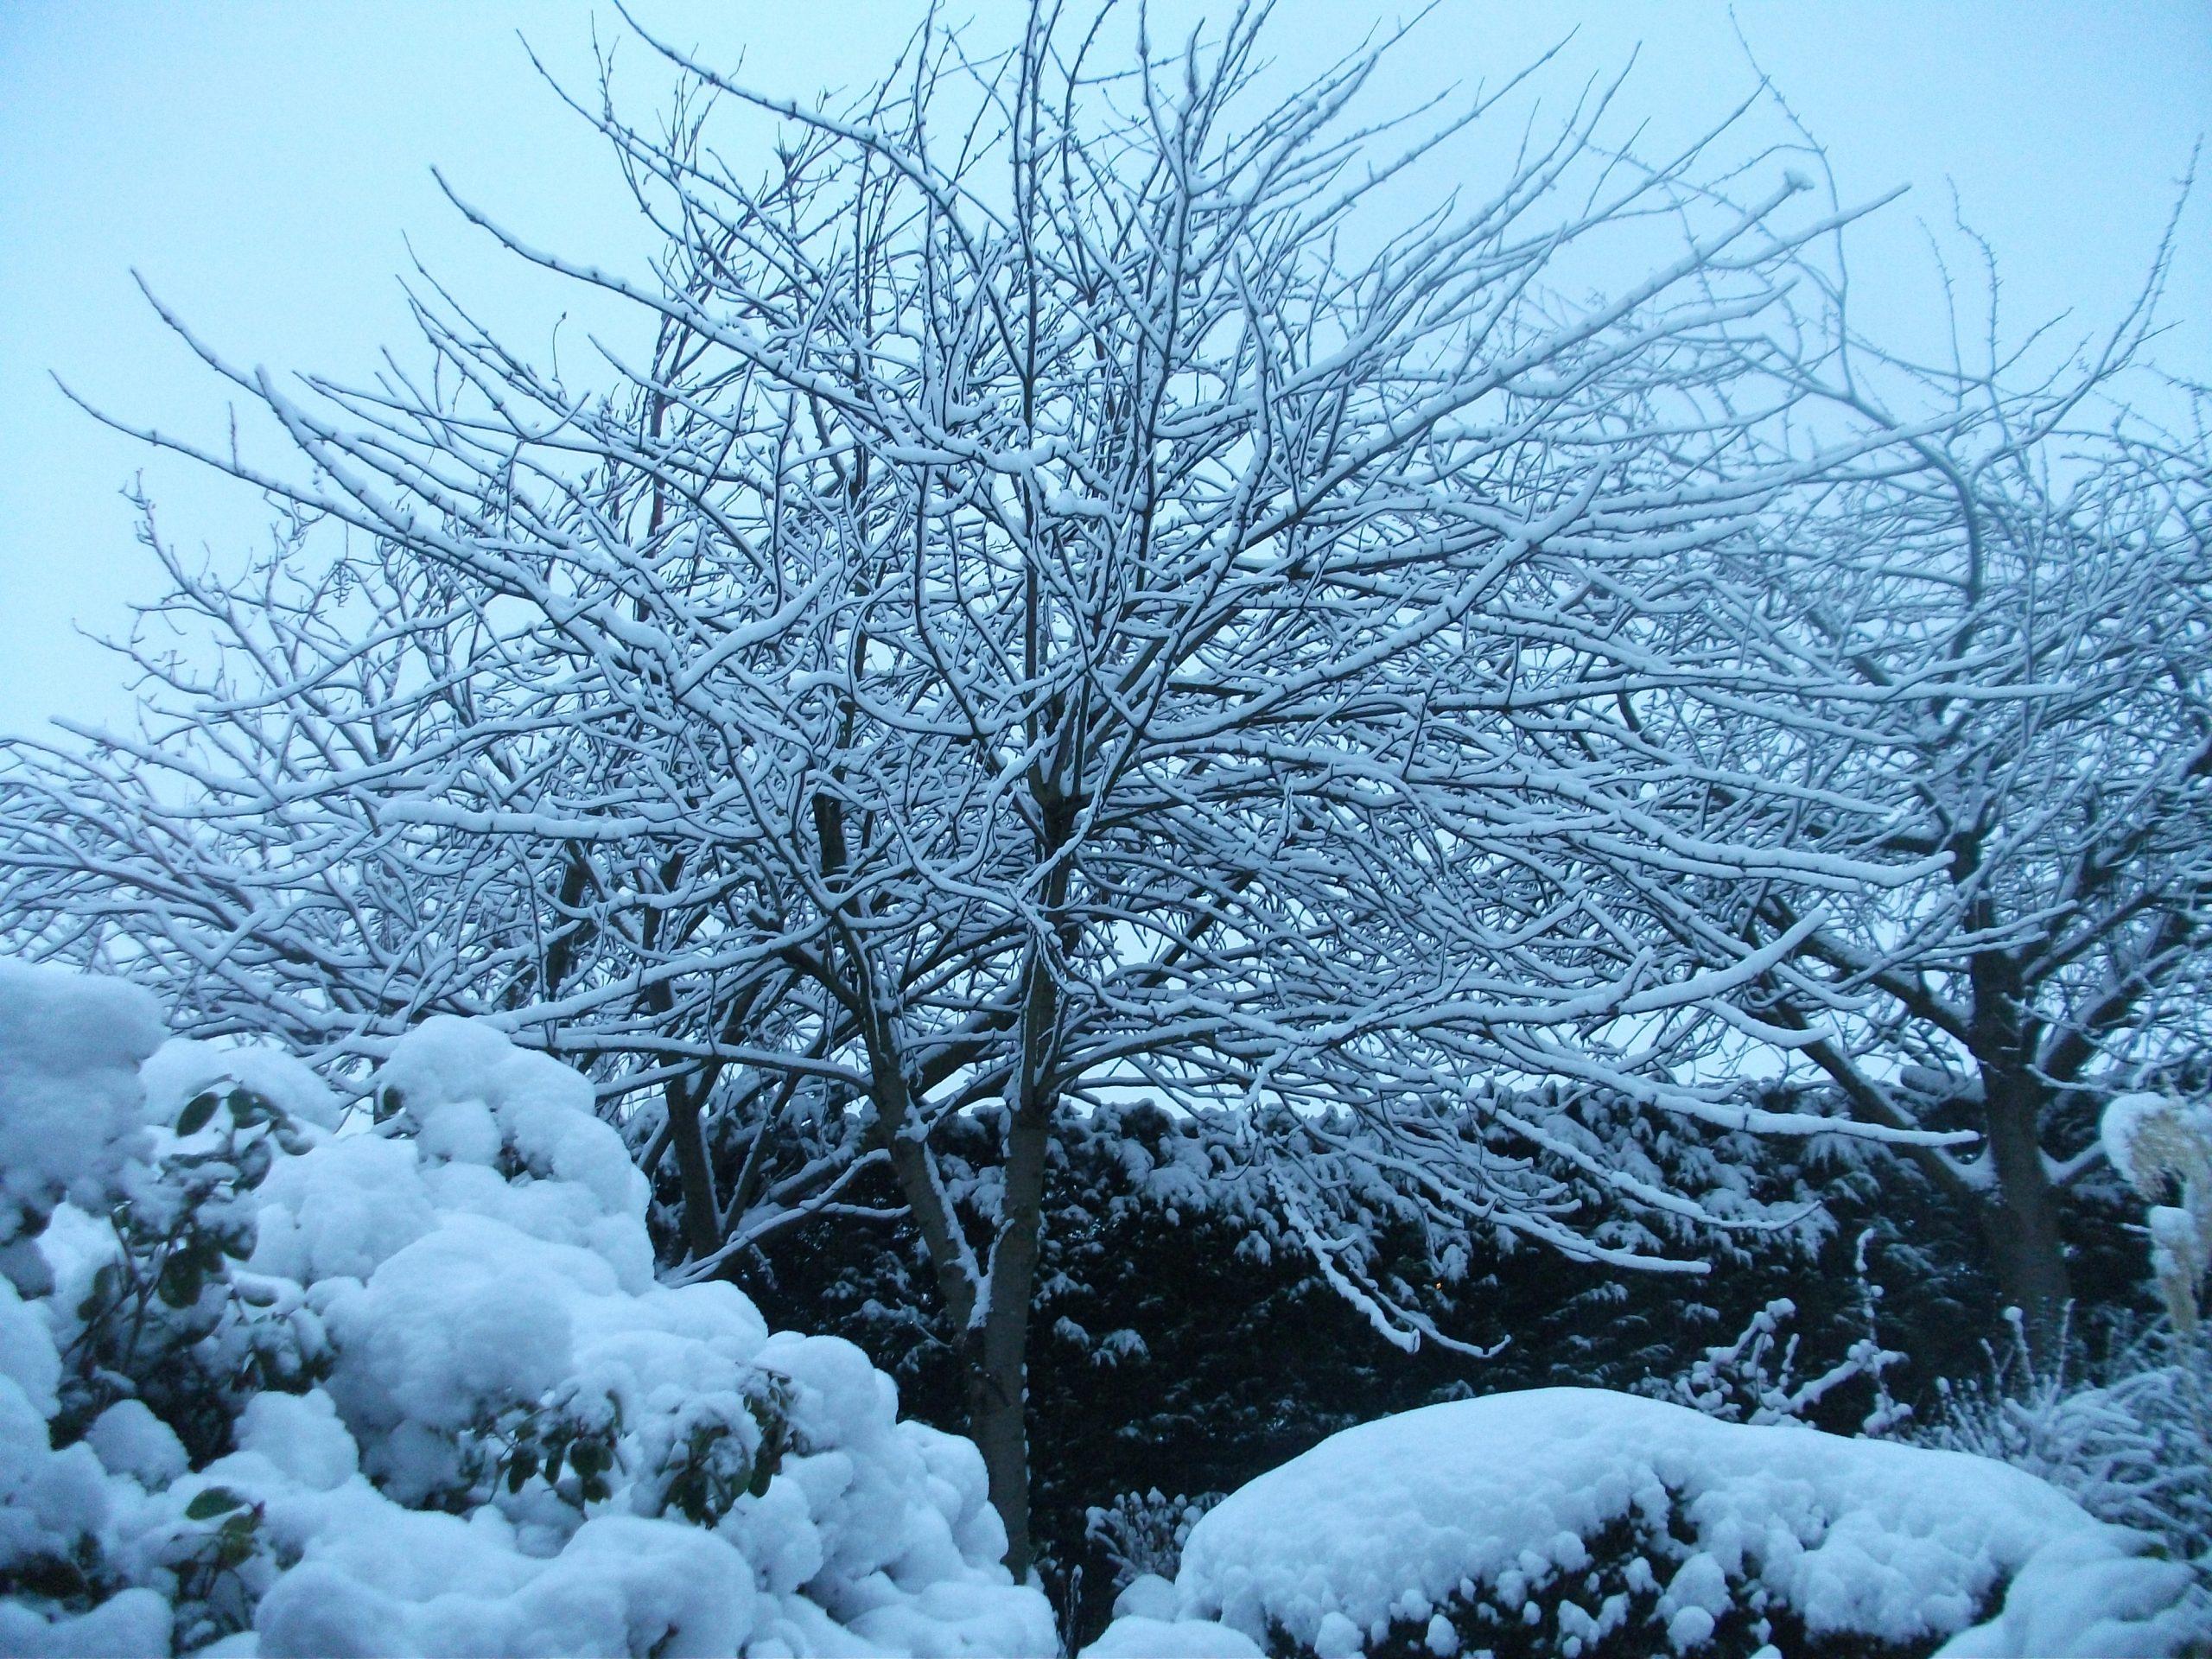 Snowy scene in Clifton